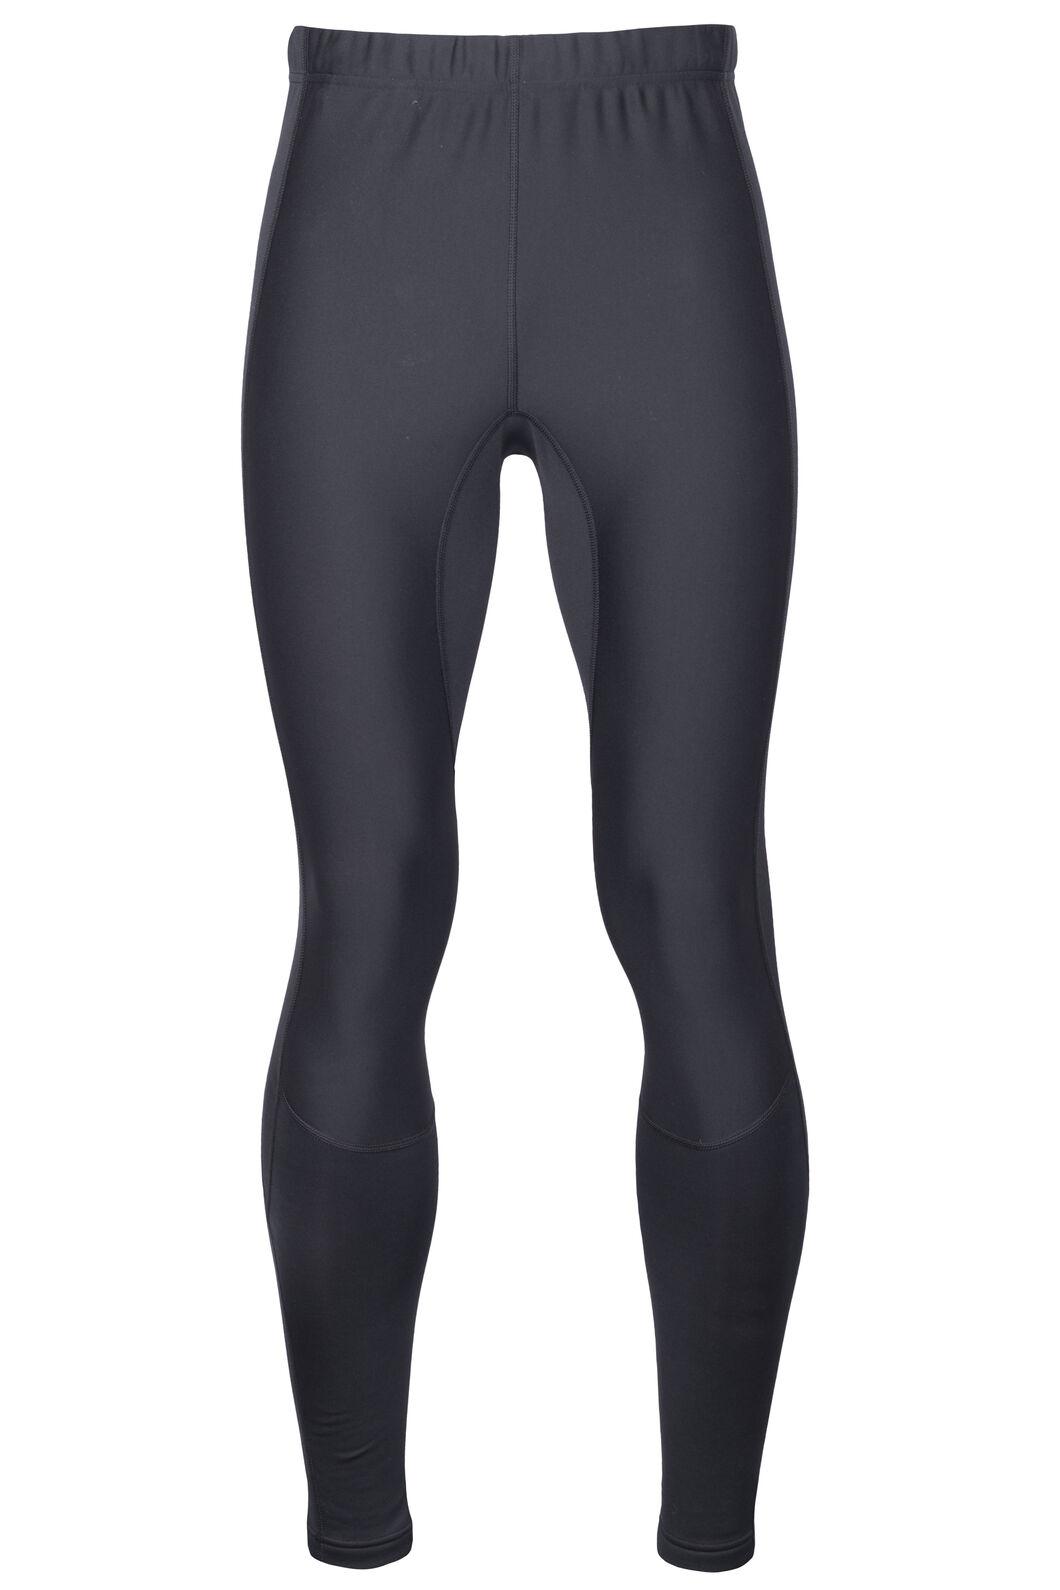 Macpac Traverse Fleece Tights - Men's, Black, hi-res